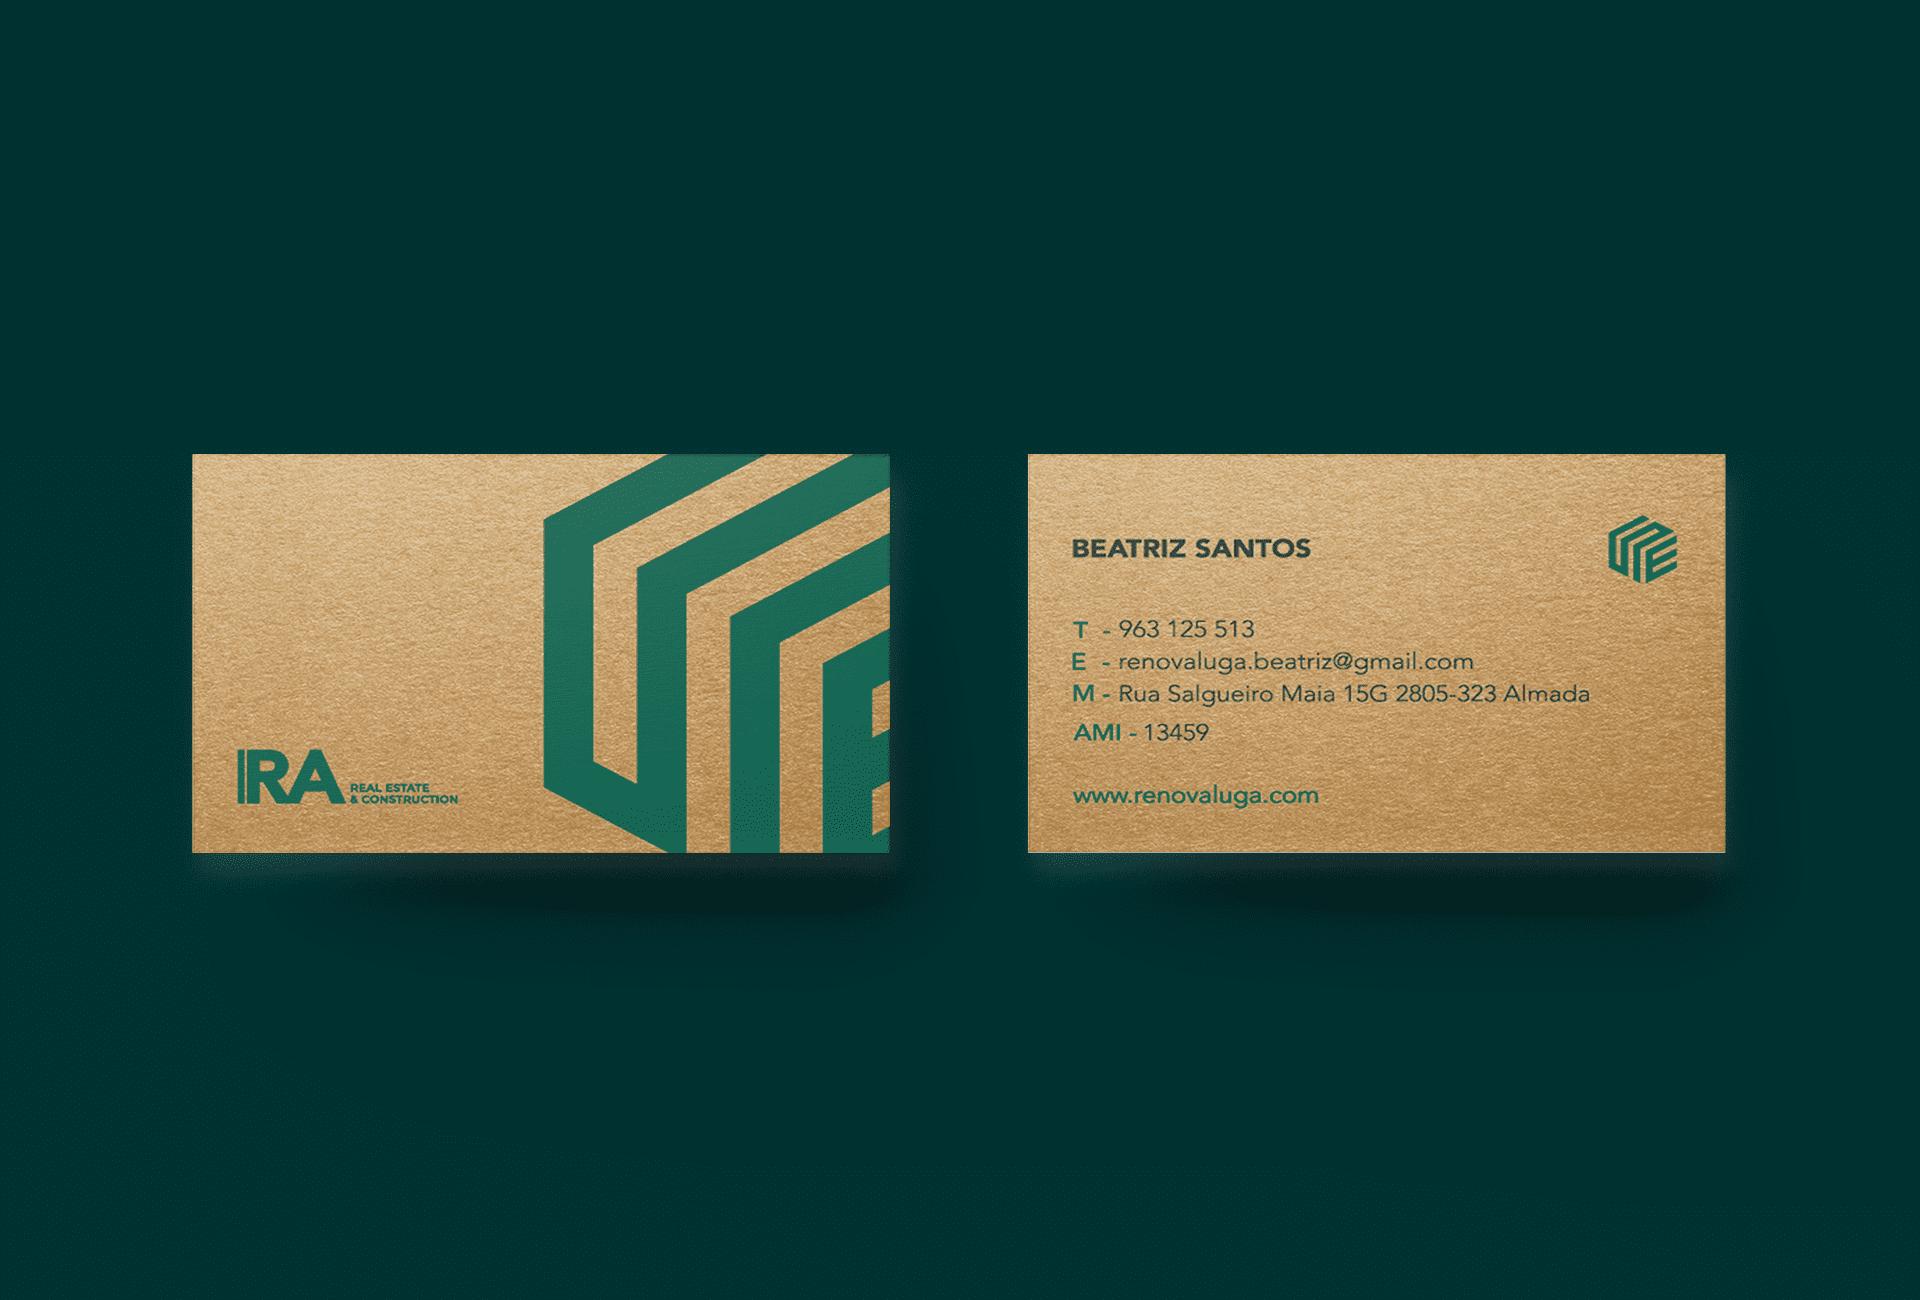 Cartões de visita Renovaluga